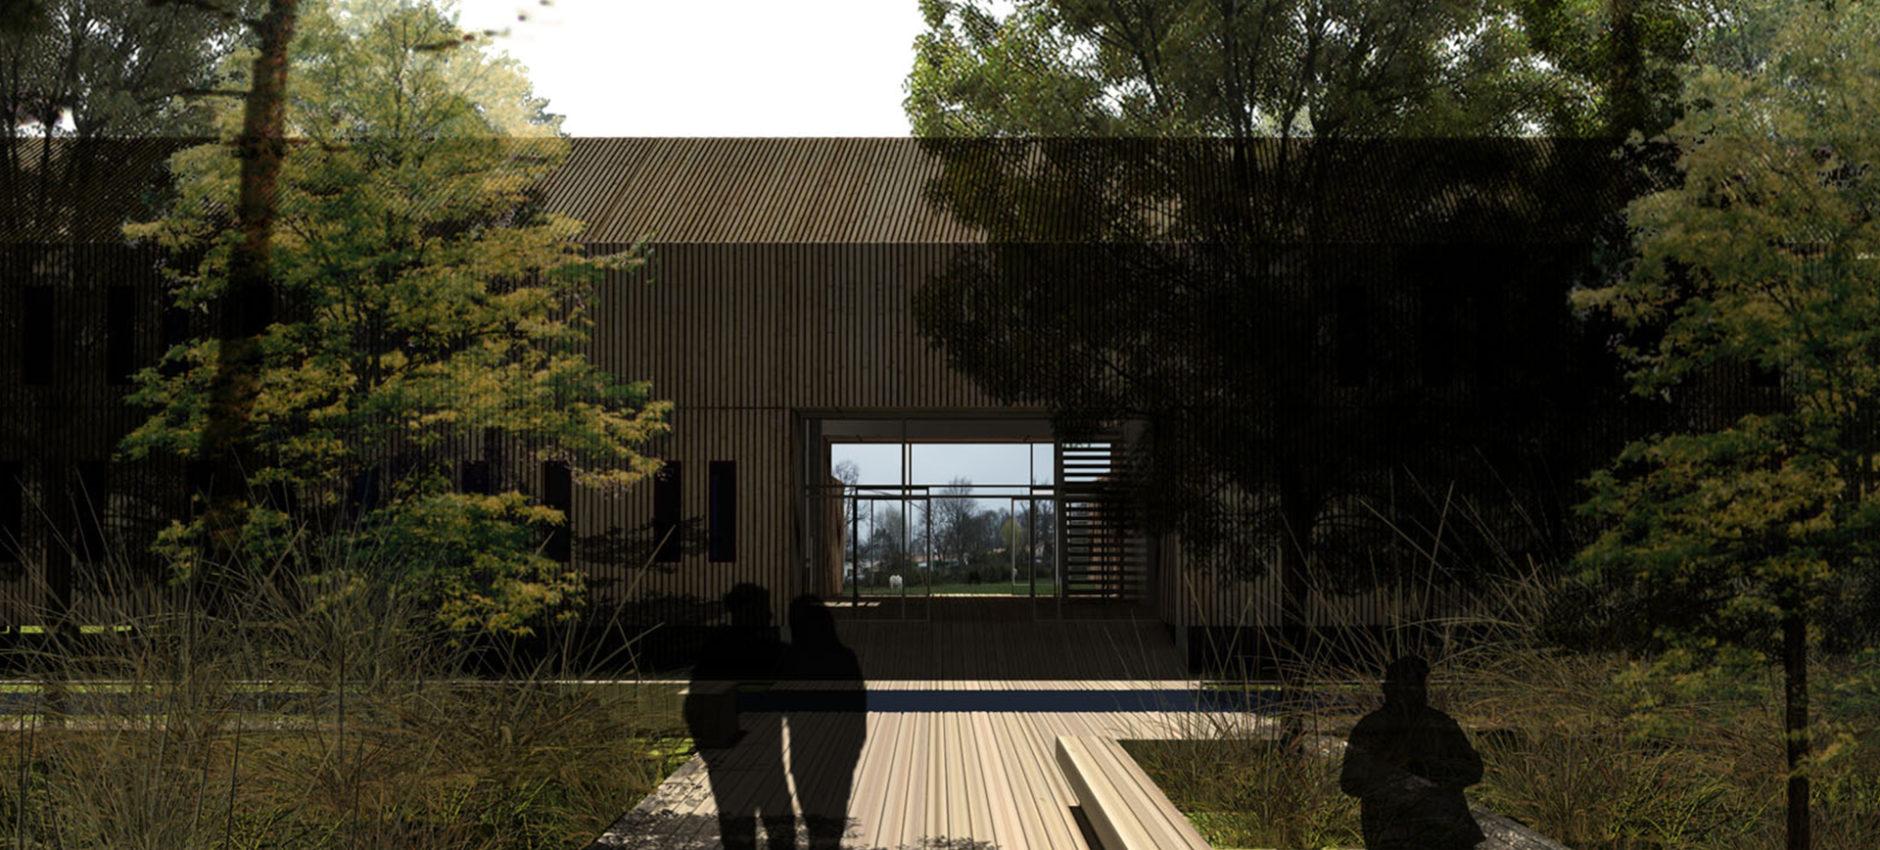 boca_architecture_projet_centre_thalasso_lanton_02.jpg